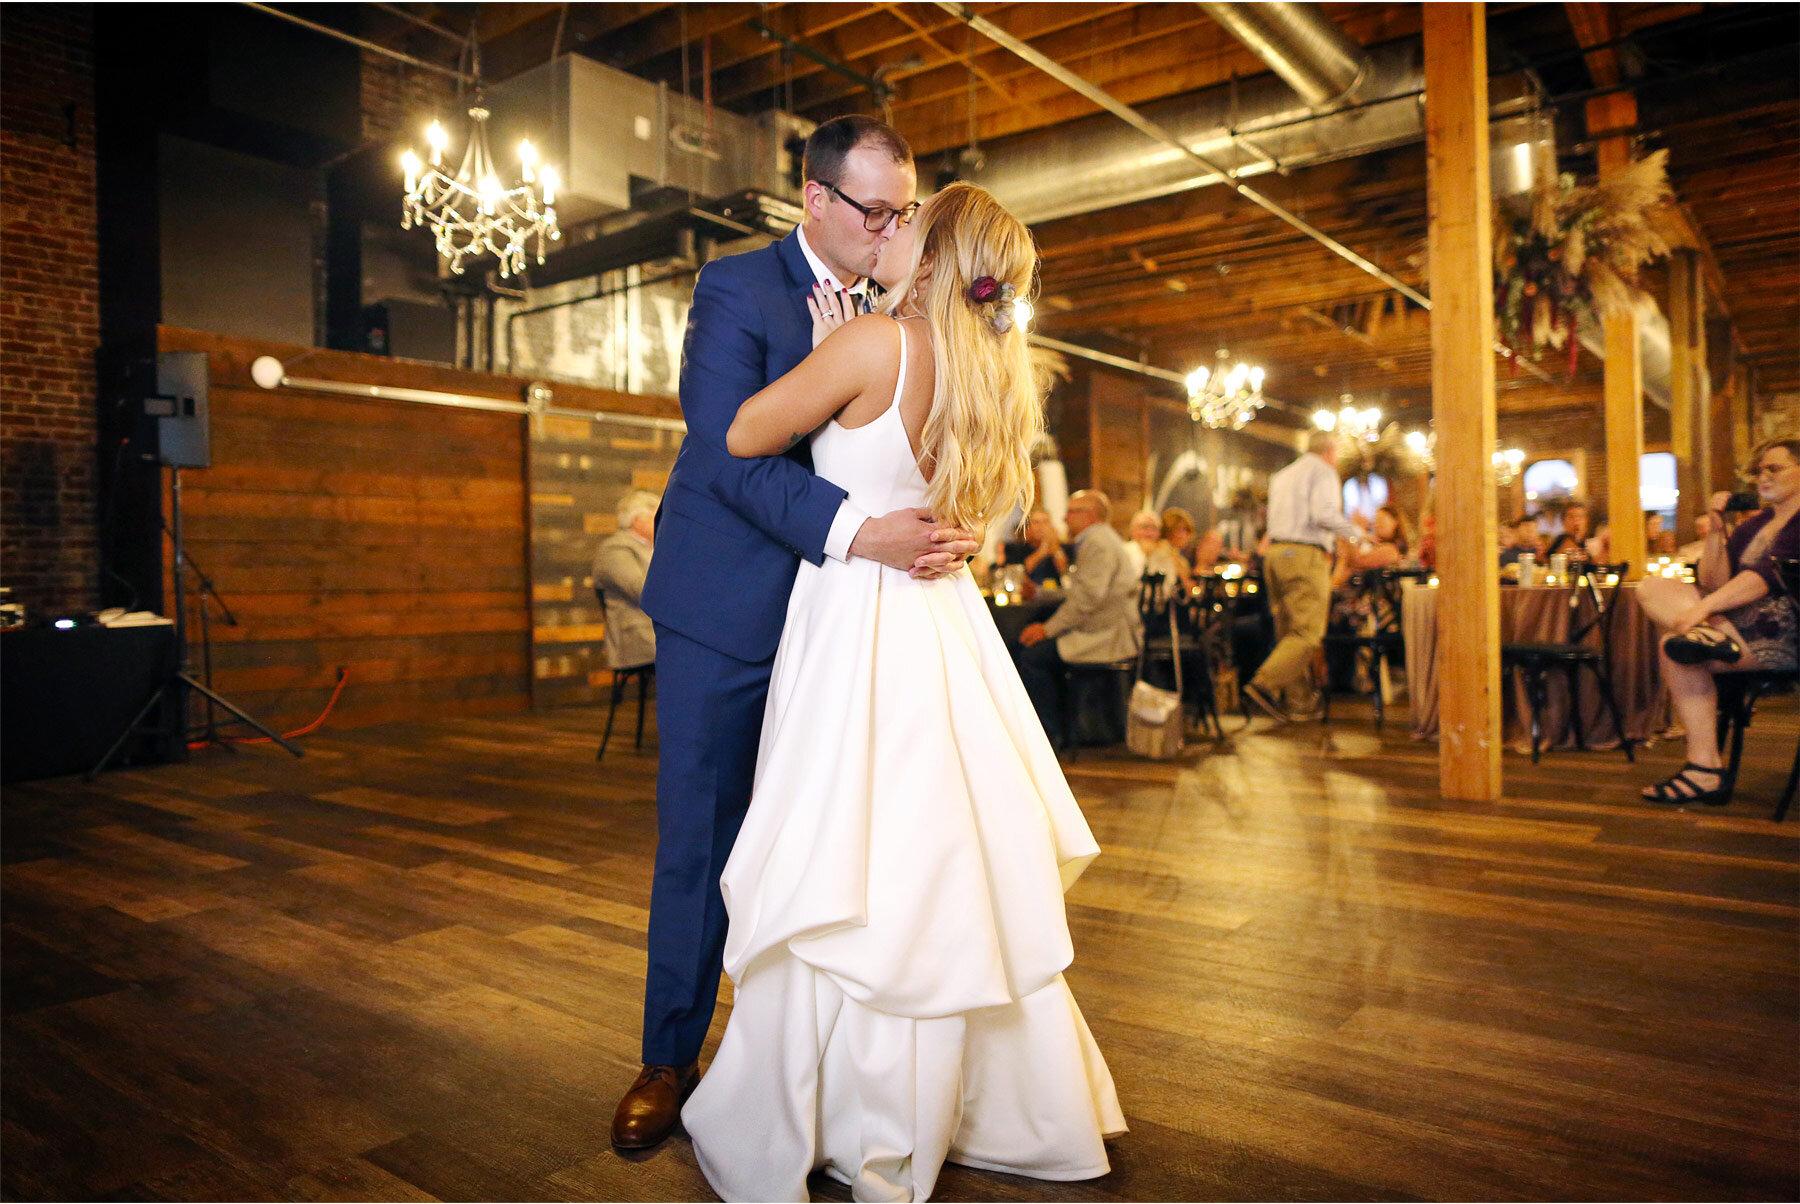 17-Vick-Photography-Wedding-Minneapolis-Minnesota-Earl-and-Wilson-Bride-Groom-Reception-Dance-Danielle-and-Tom.jpg